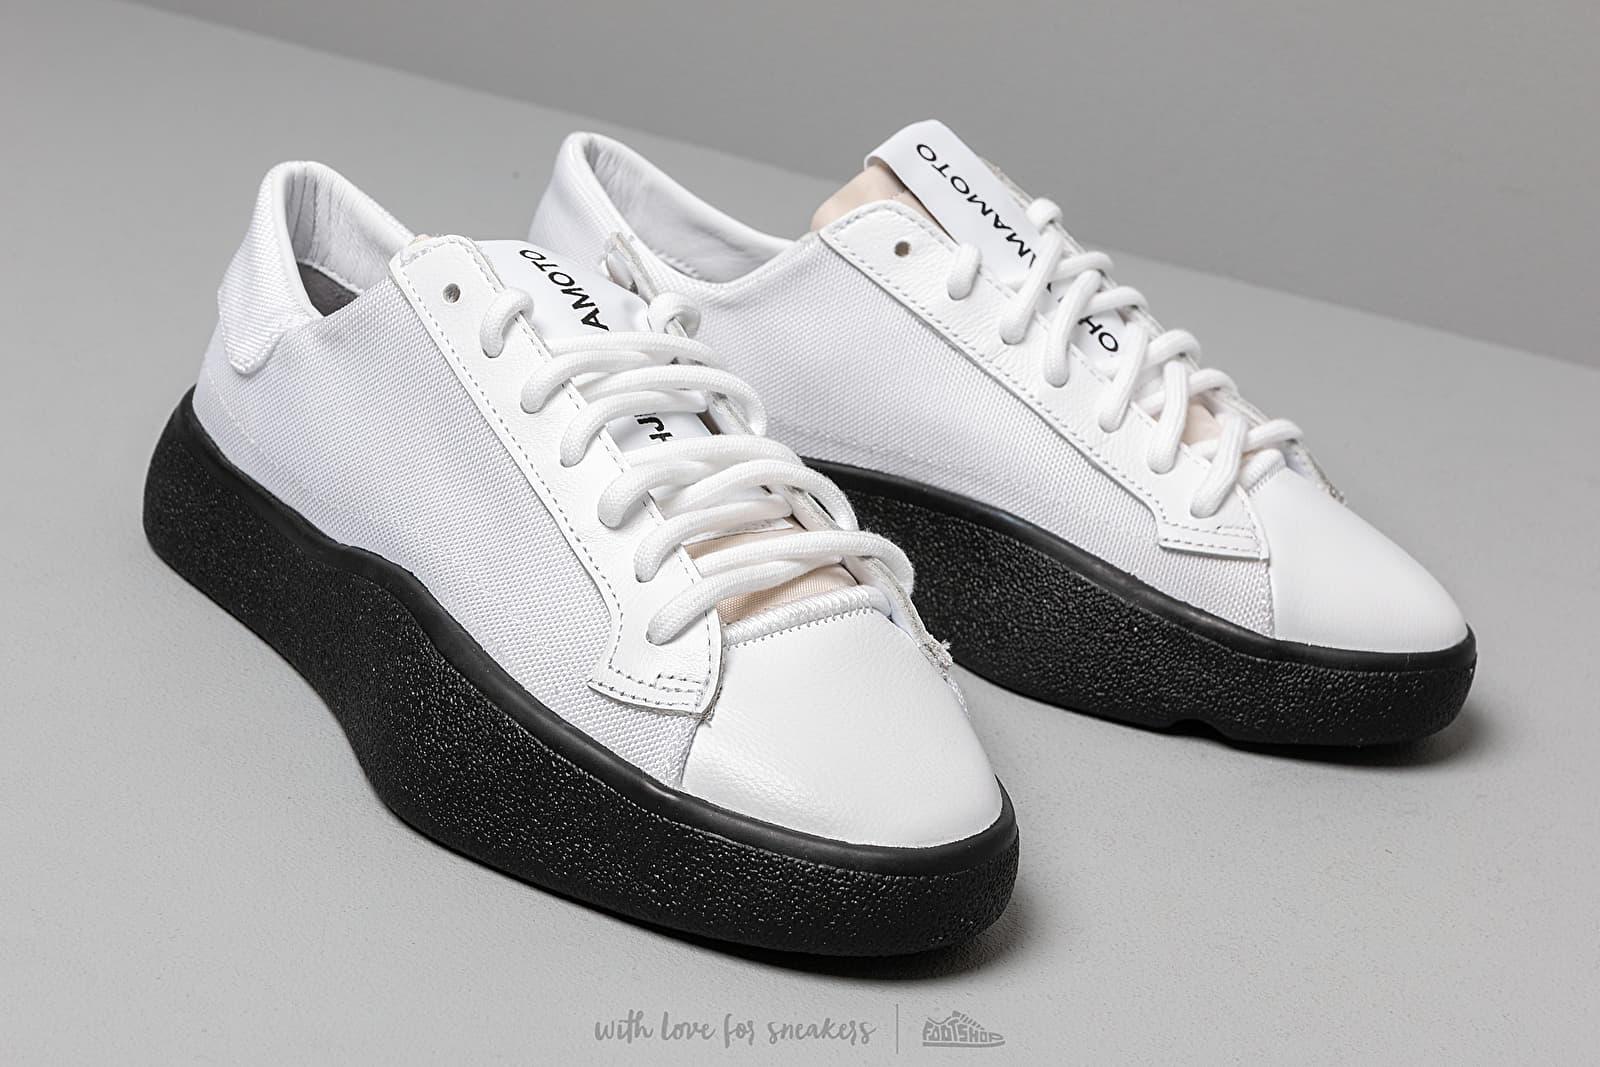 y3 tangutsu white The Adidas Sports